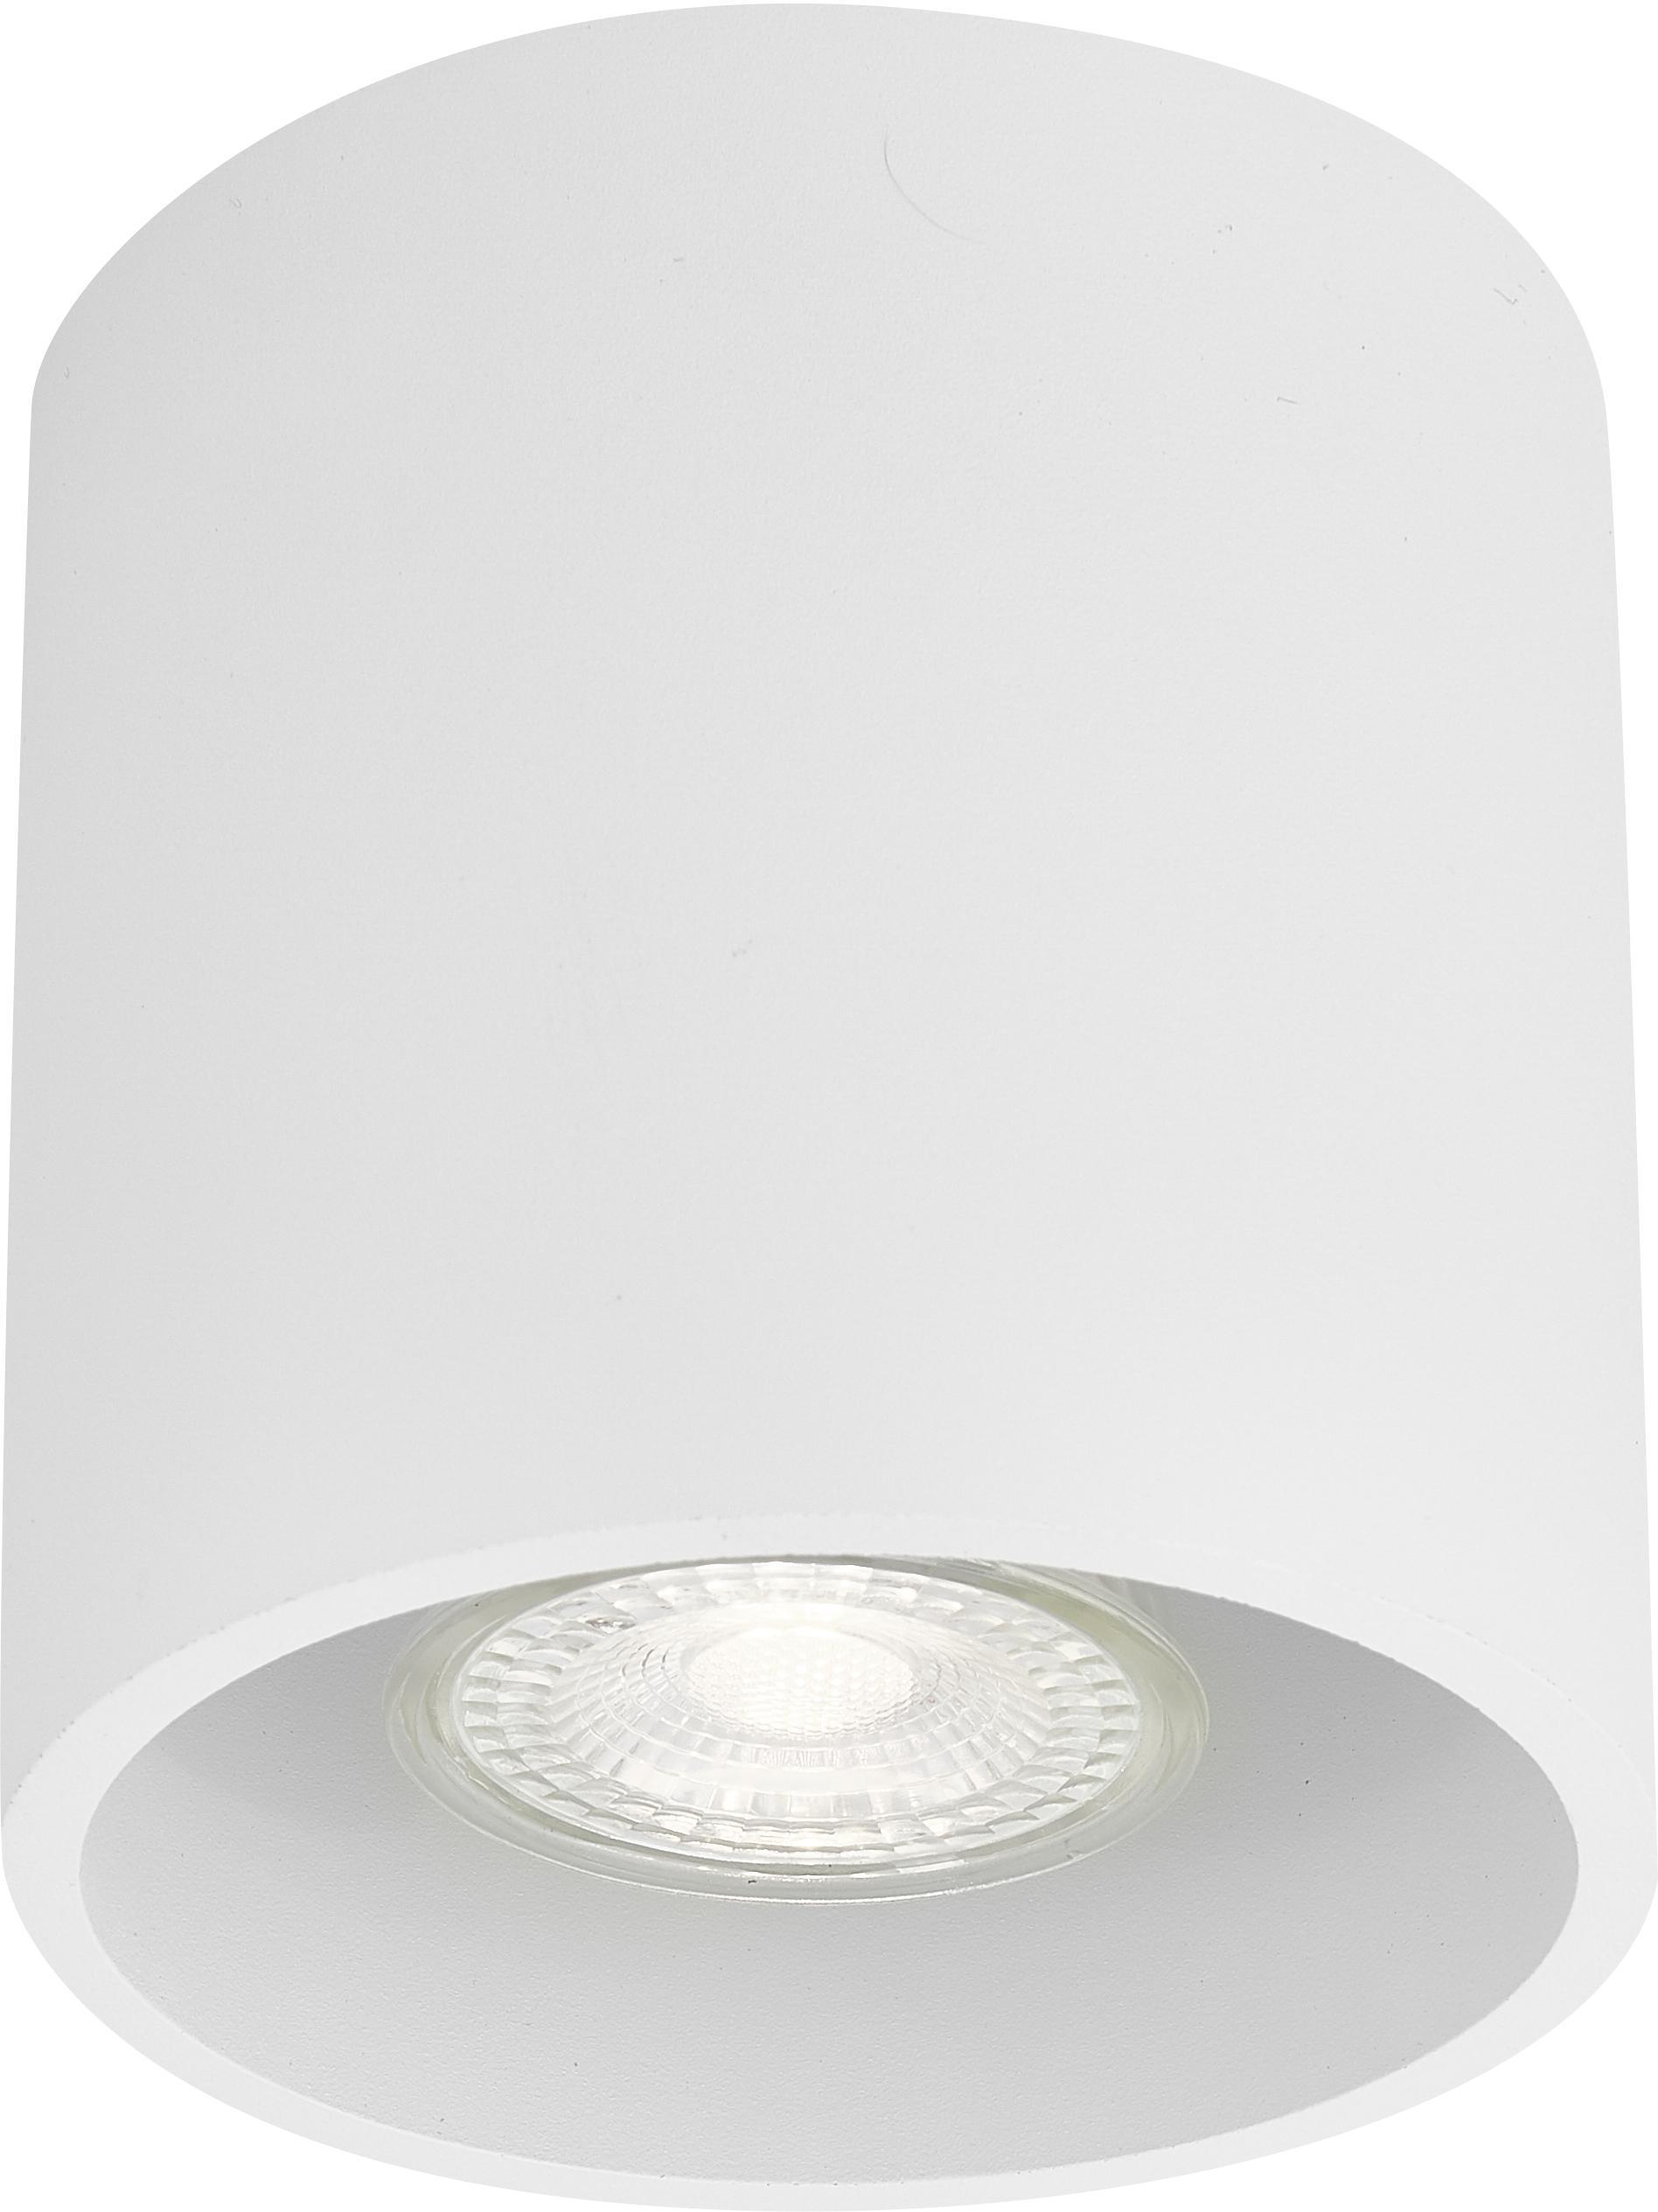 Lampa spot Roda, Aluminium powlekane, Biały, Ø 10 x W 10 cm